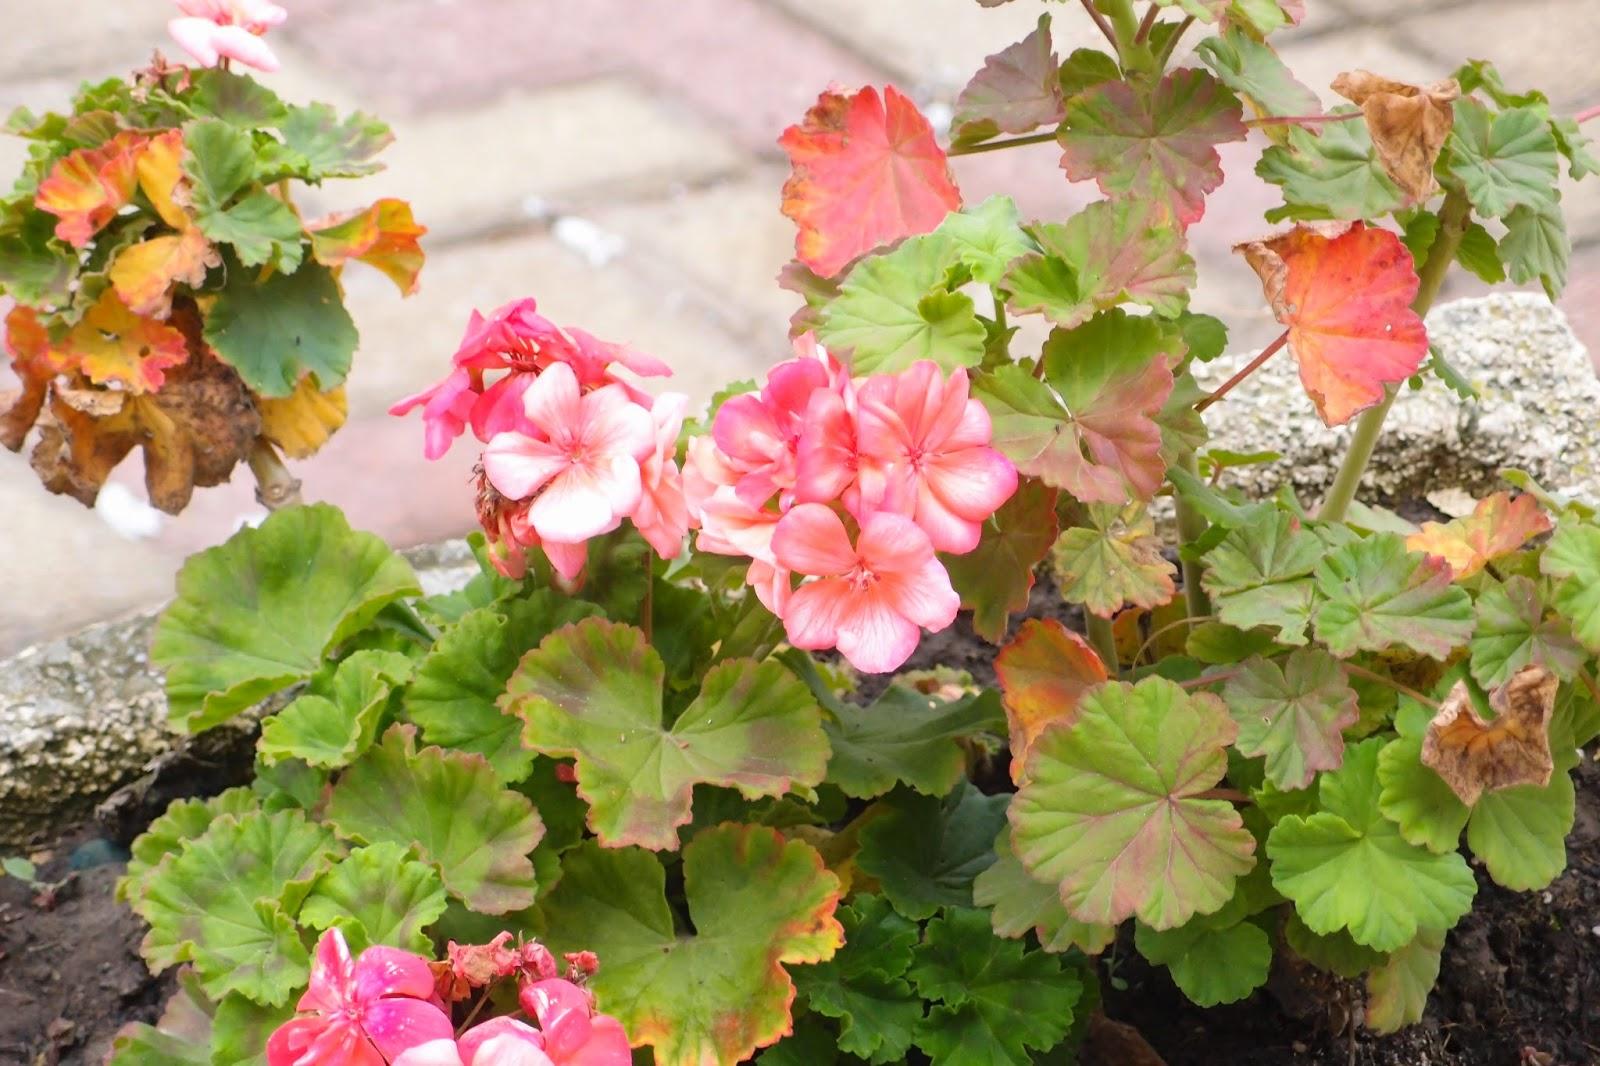 geranium flowerring in November